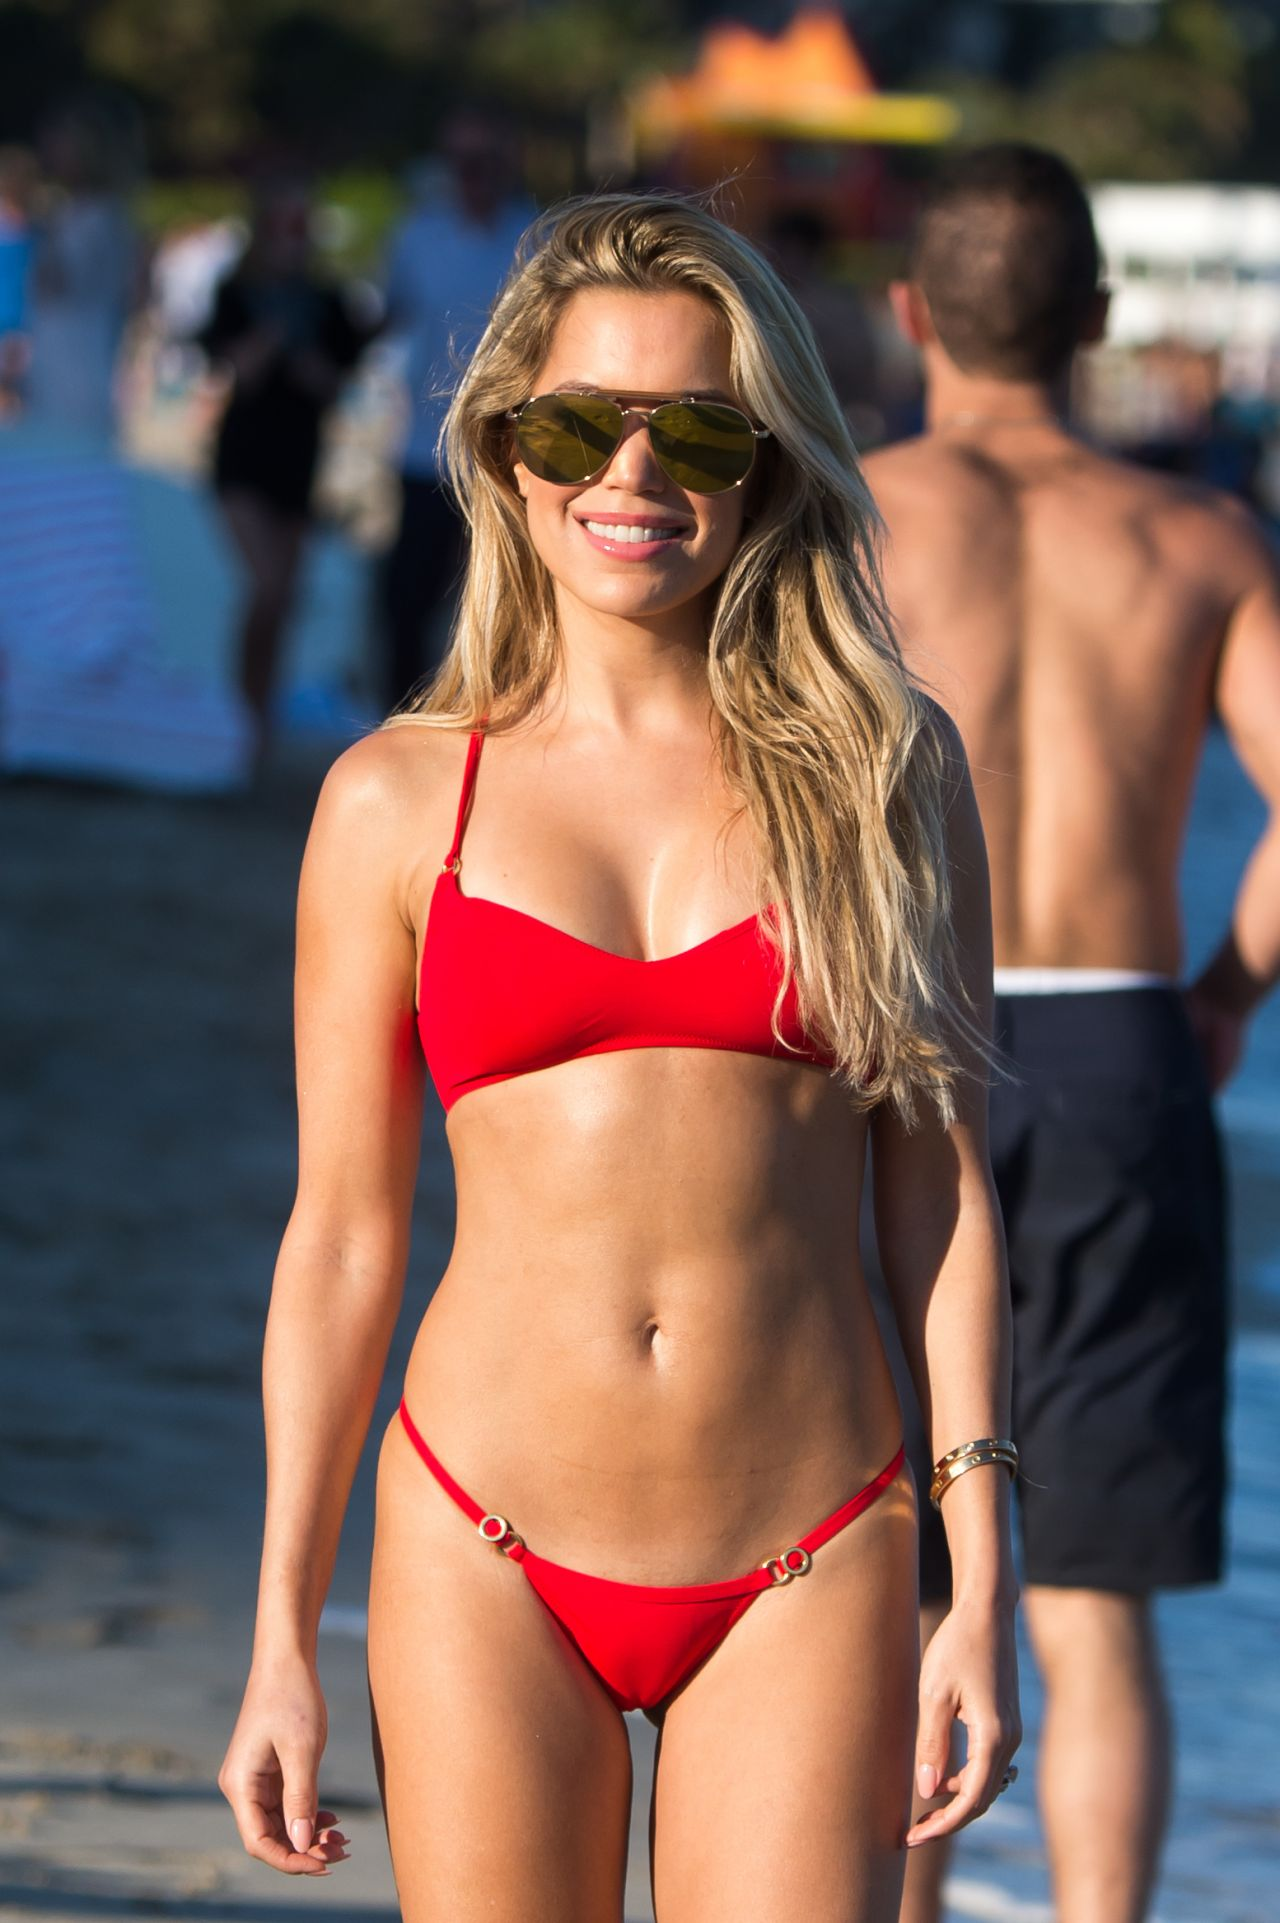 Sylvie Meis in a Red Bikini on the Beach in Miami